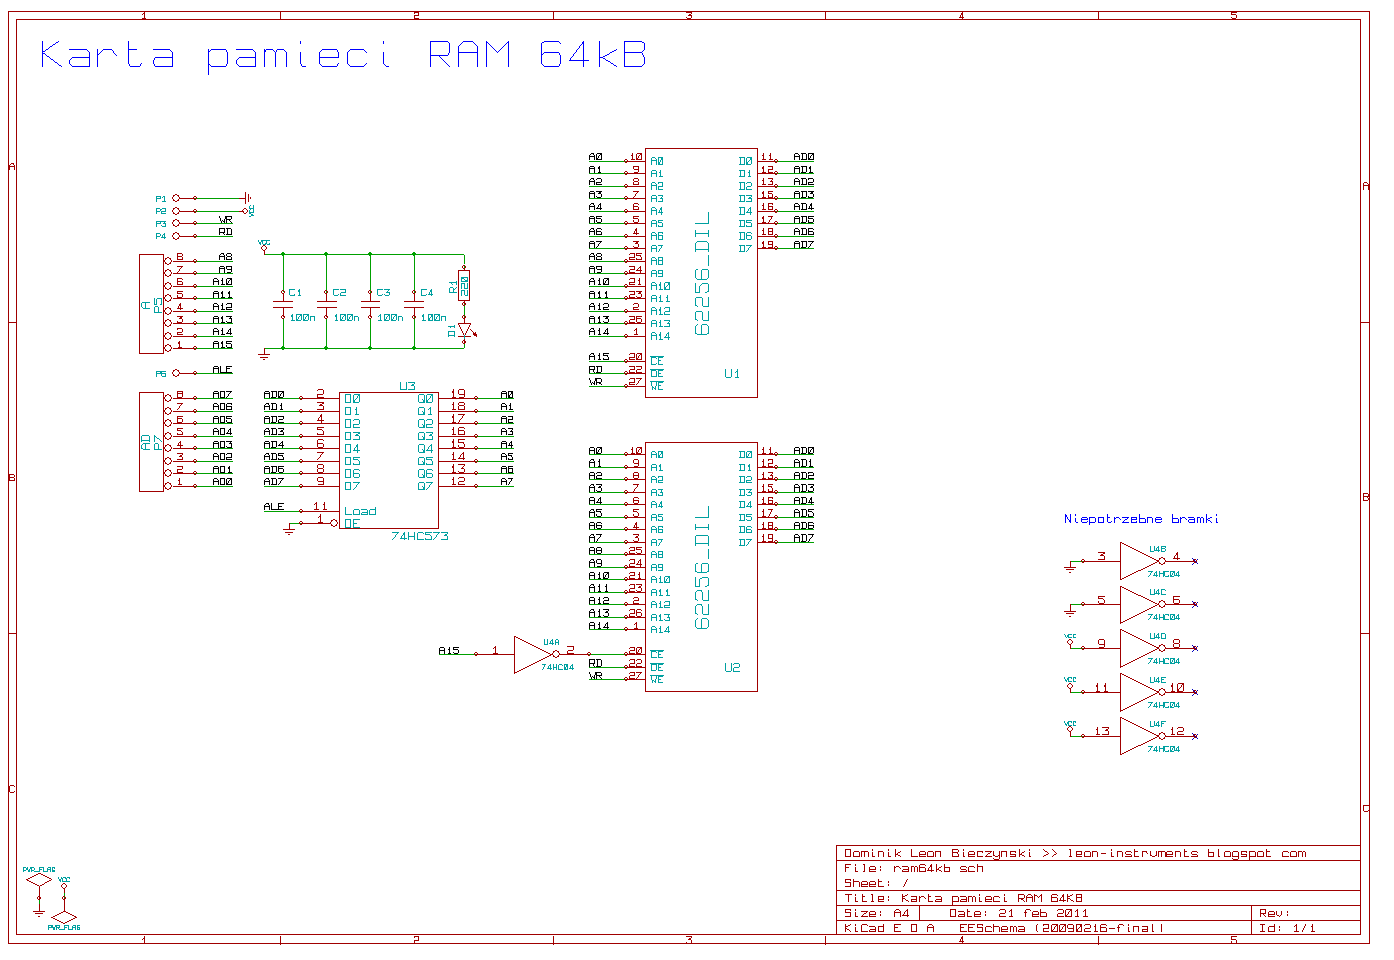 Schemat pamięci RAM